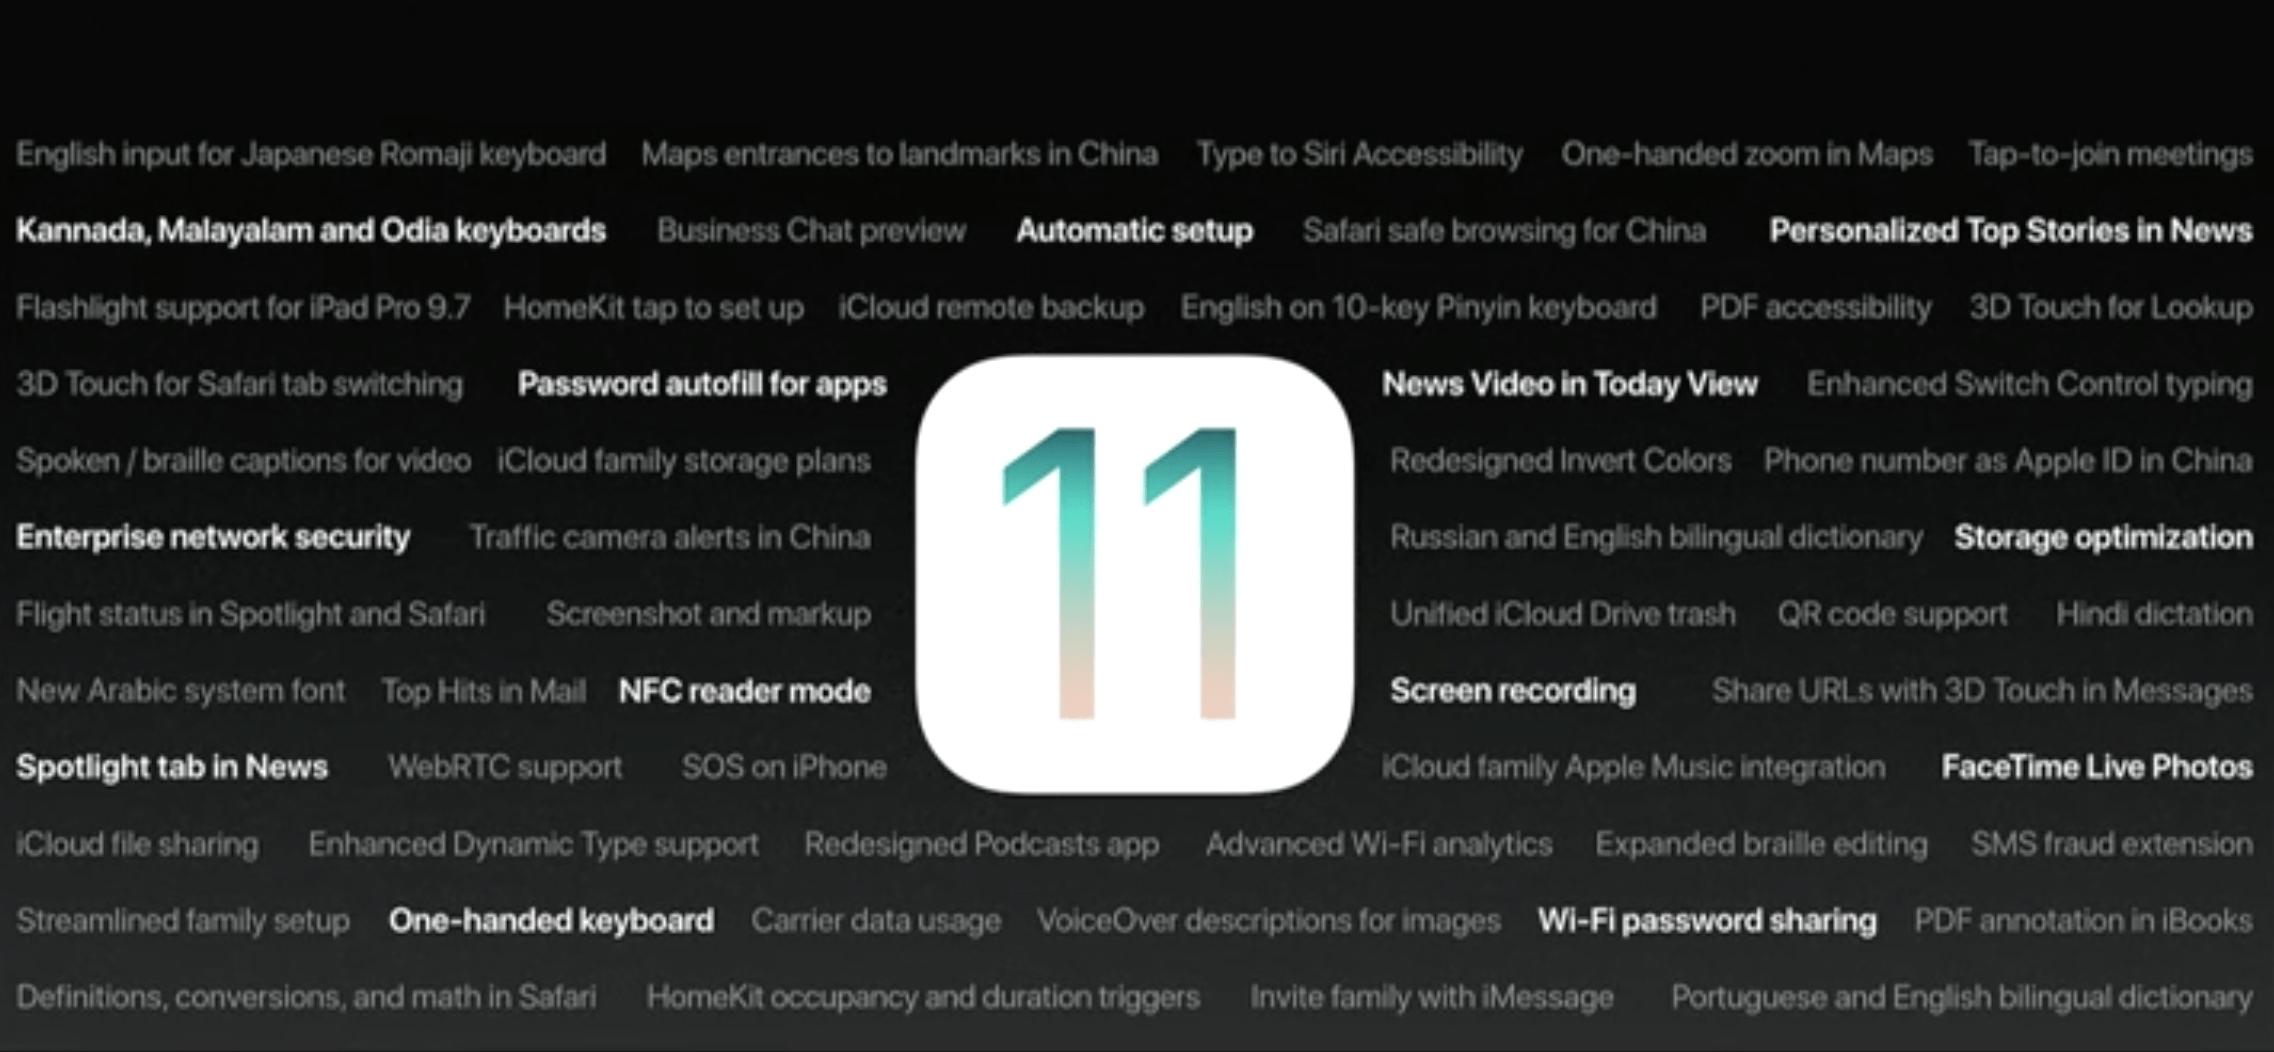 iOS 11 WWDC Hero